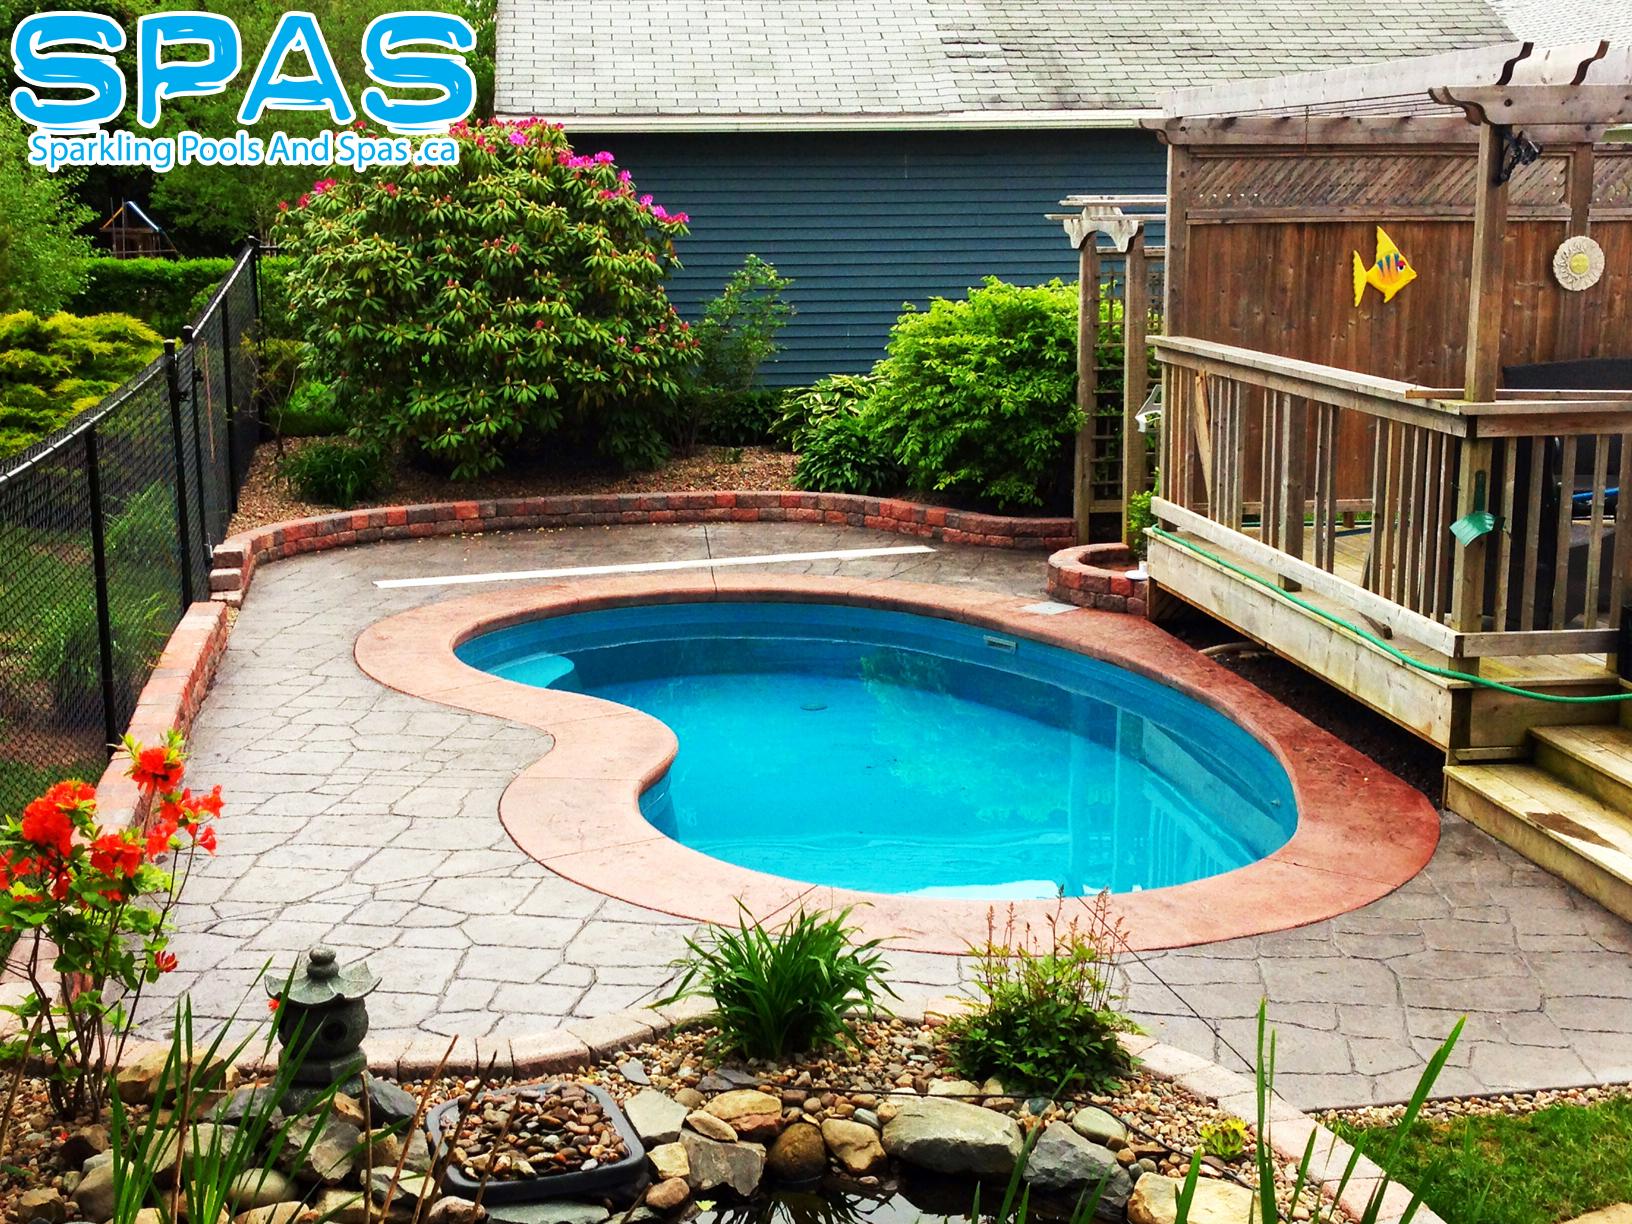 Petite trilogy fiberglass inground pool it is a jewel in the